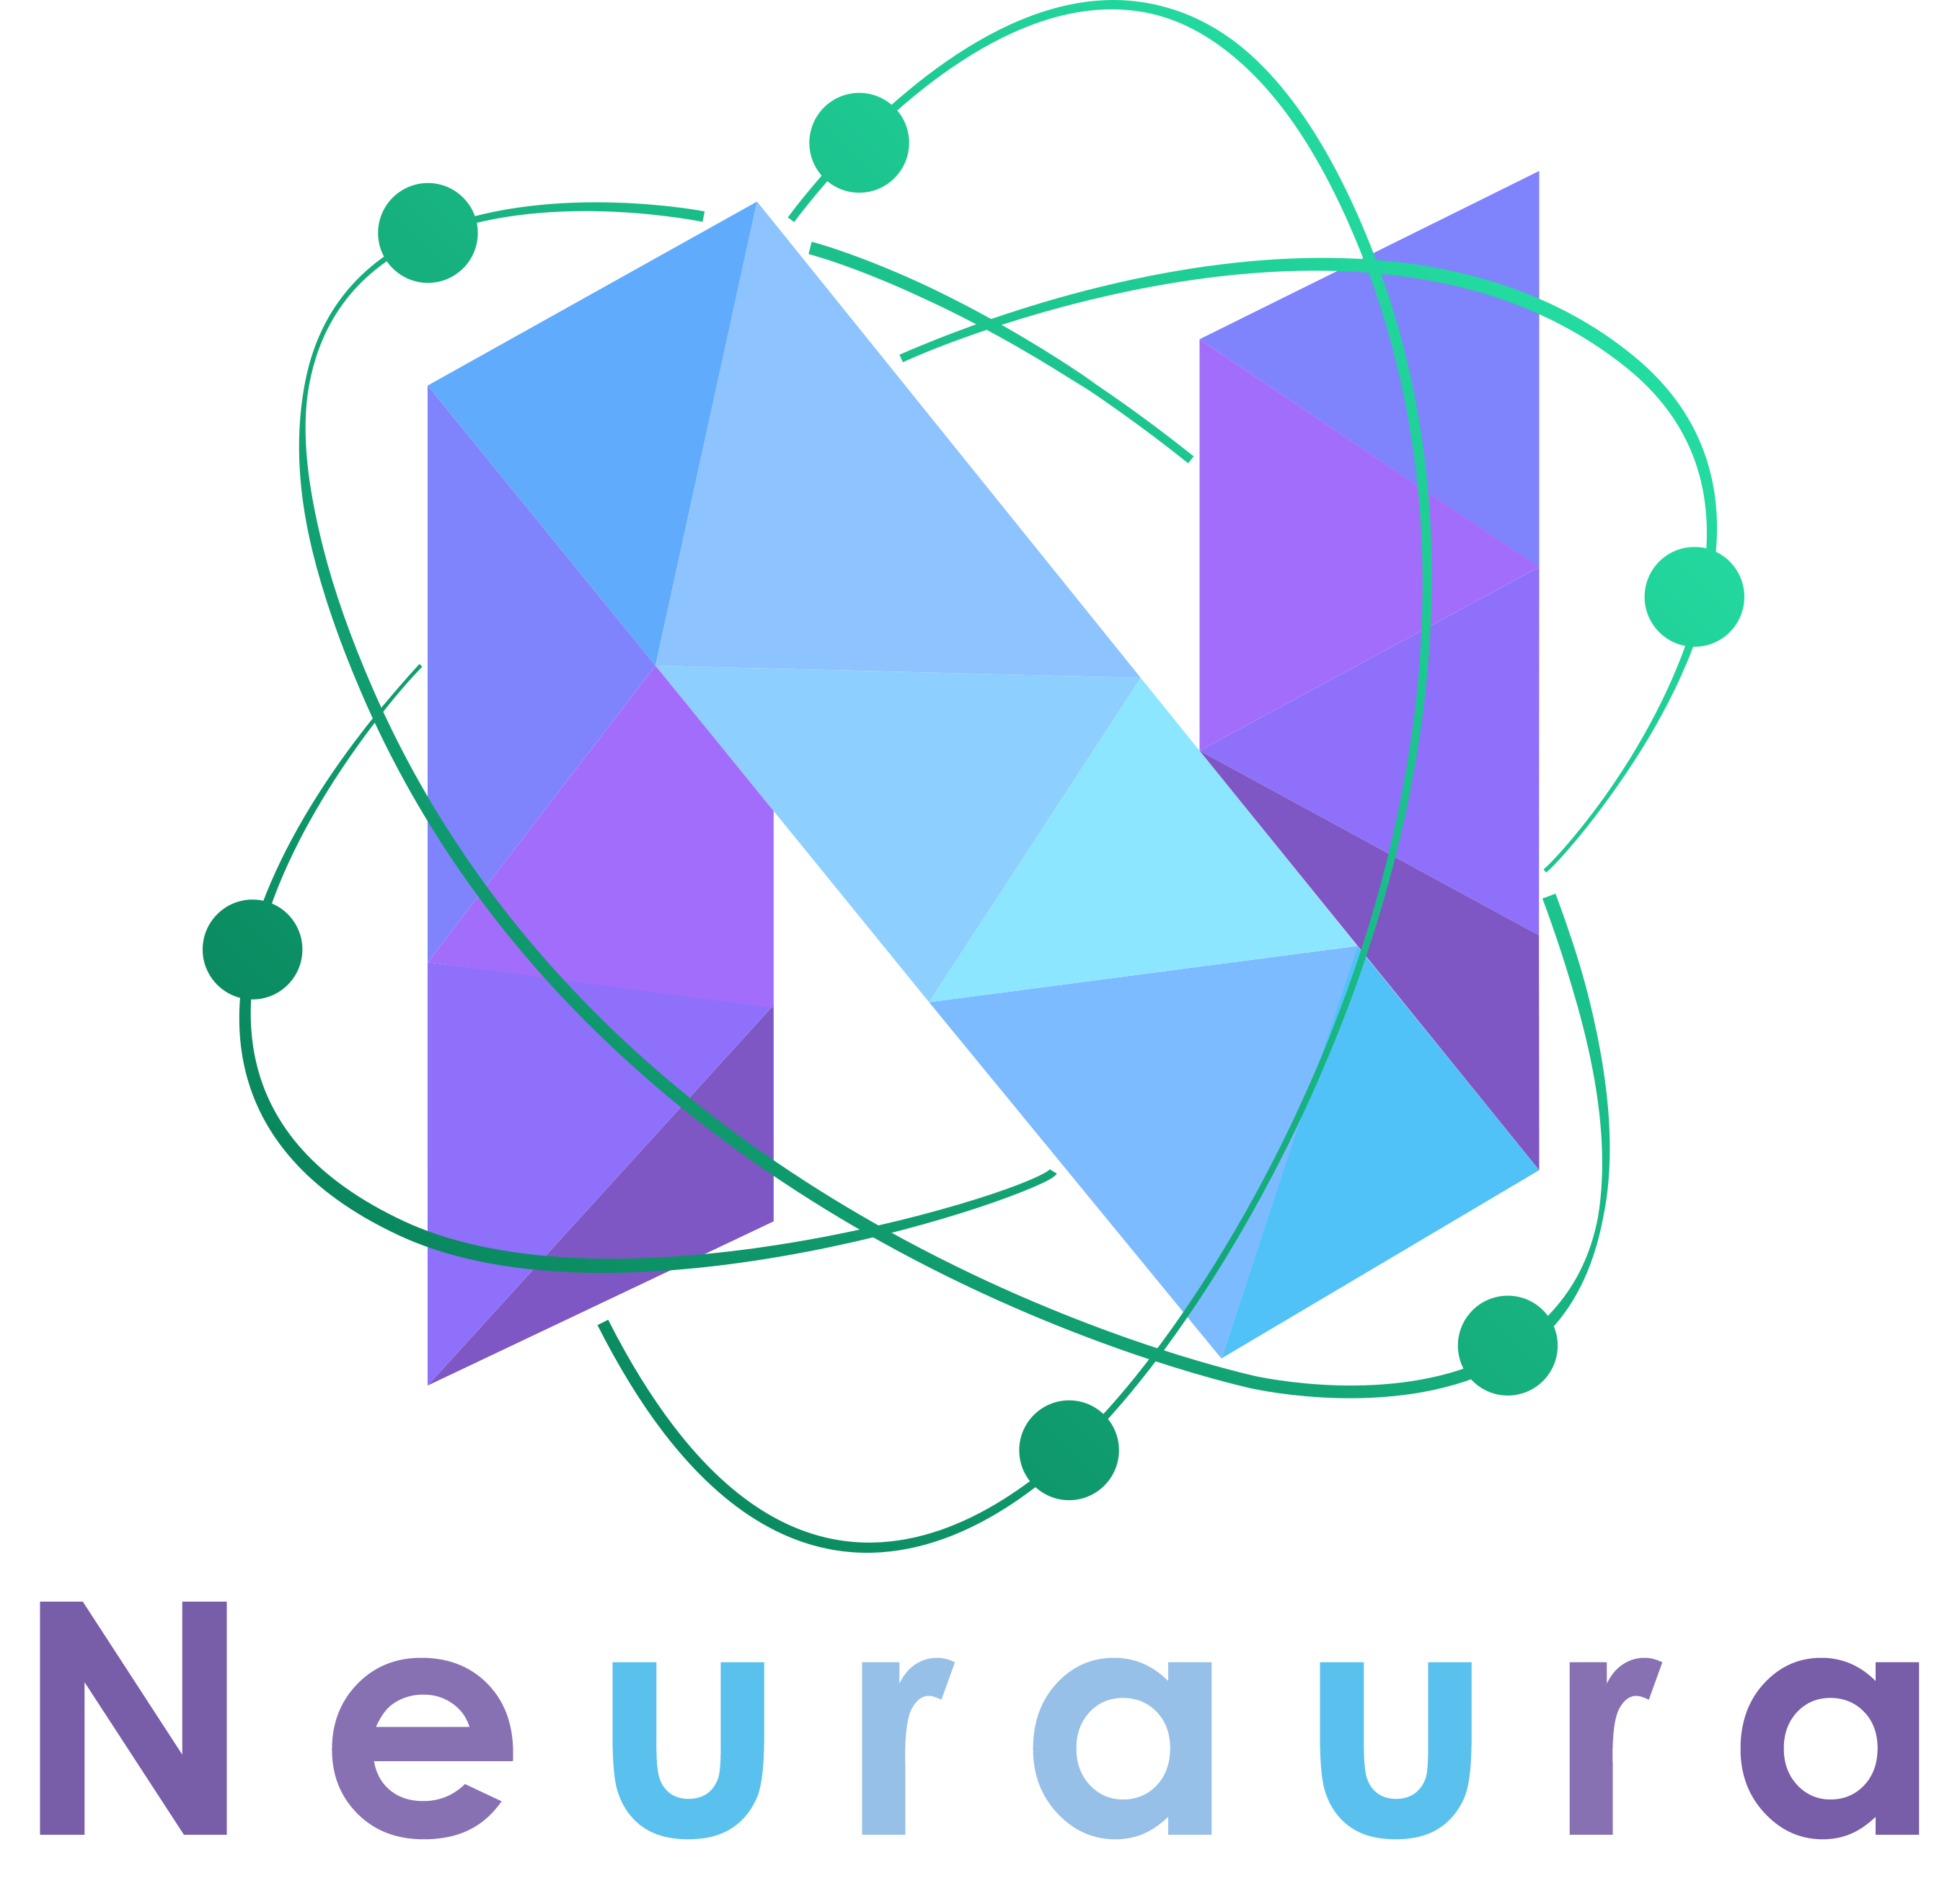 Neuraura icon